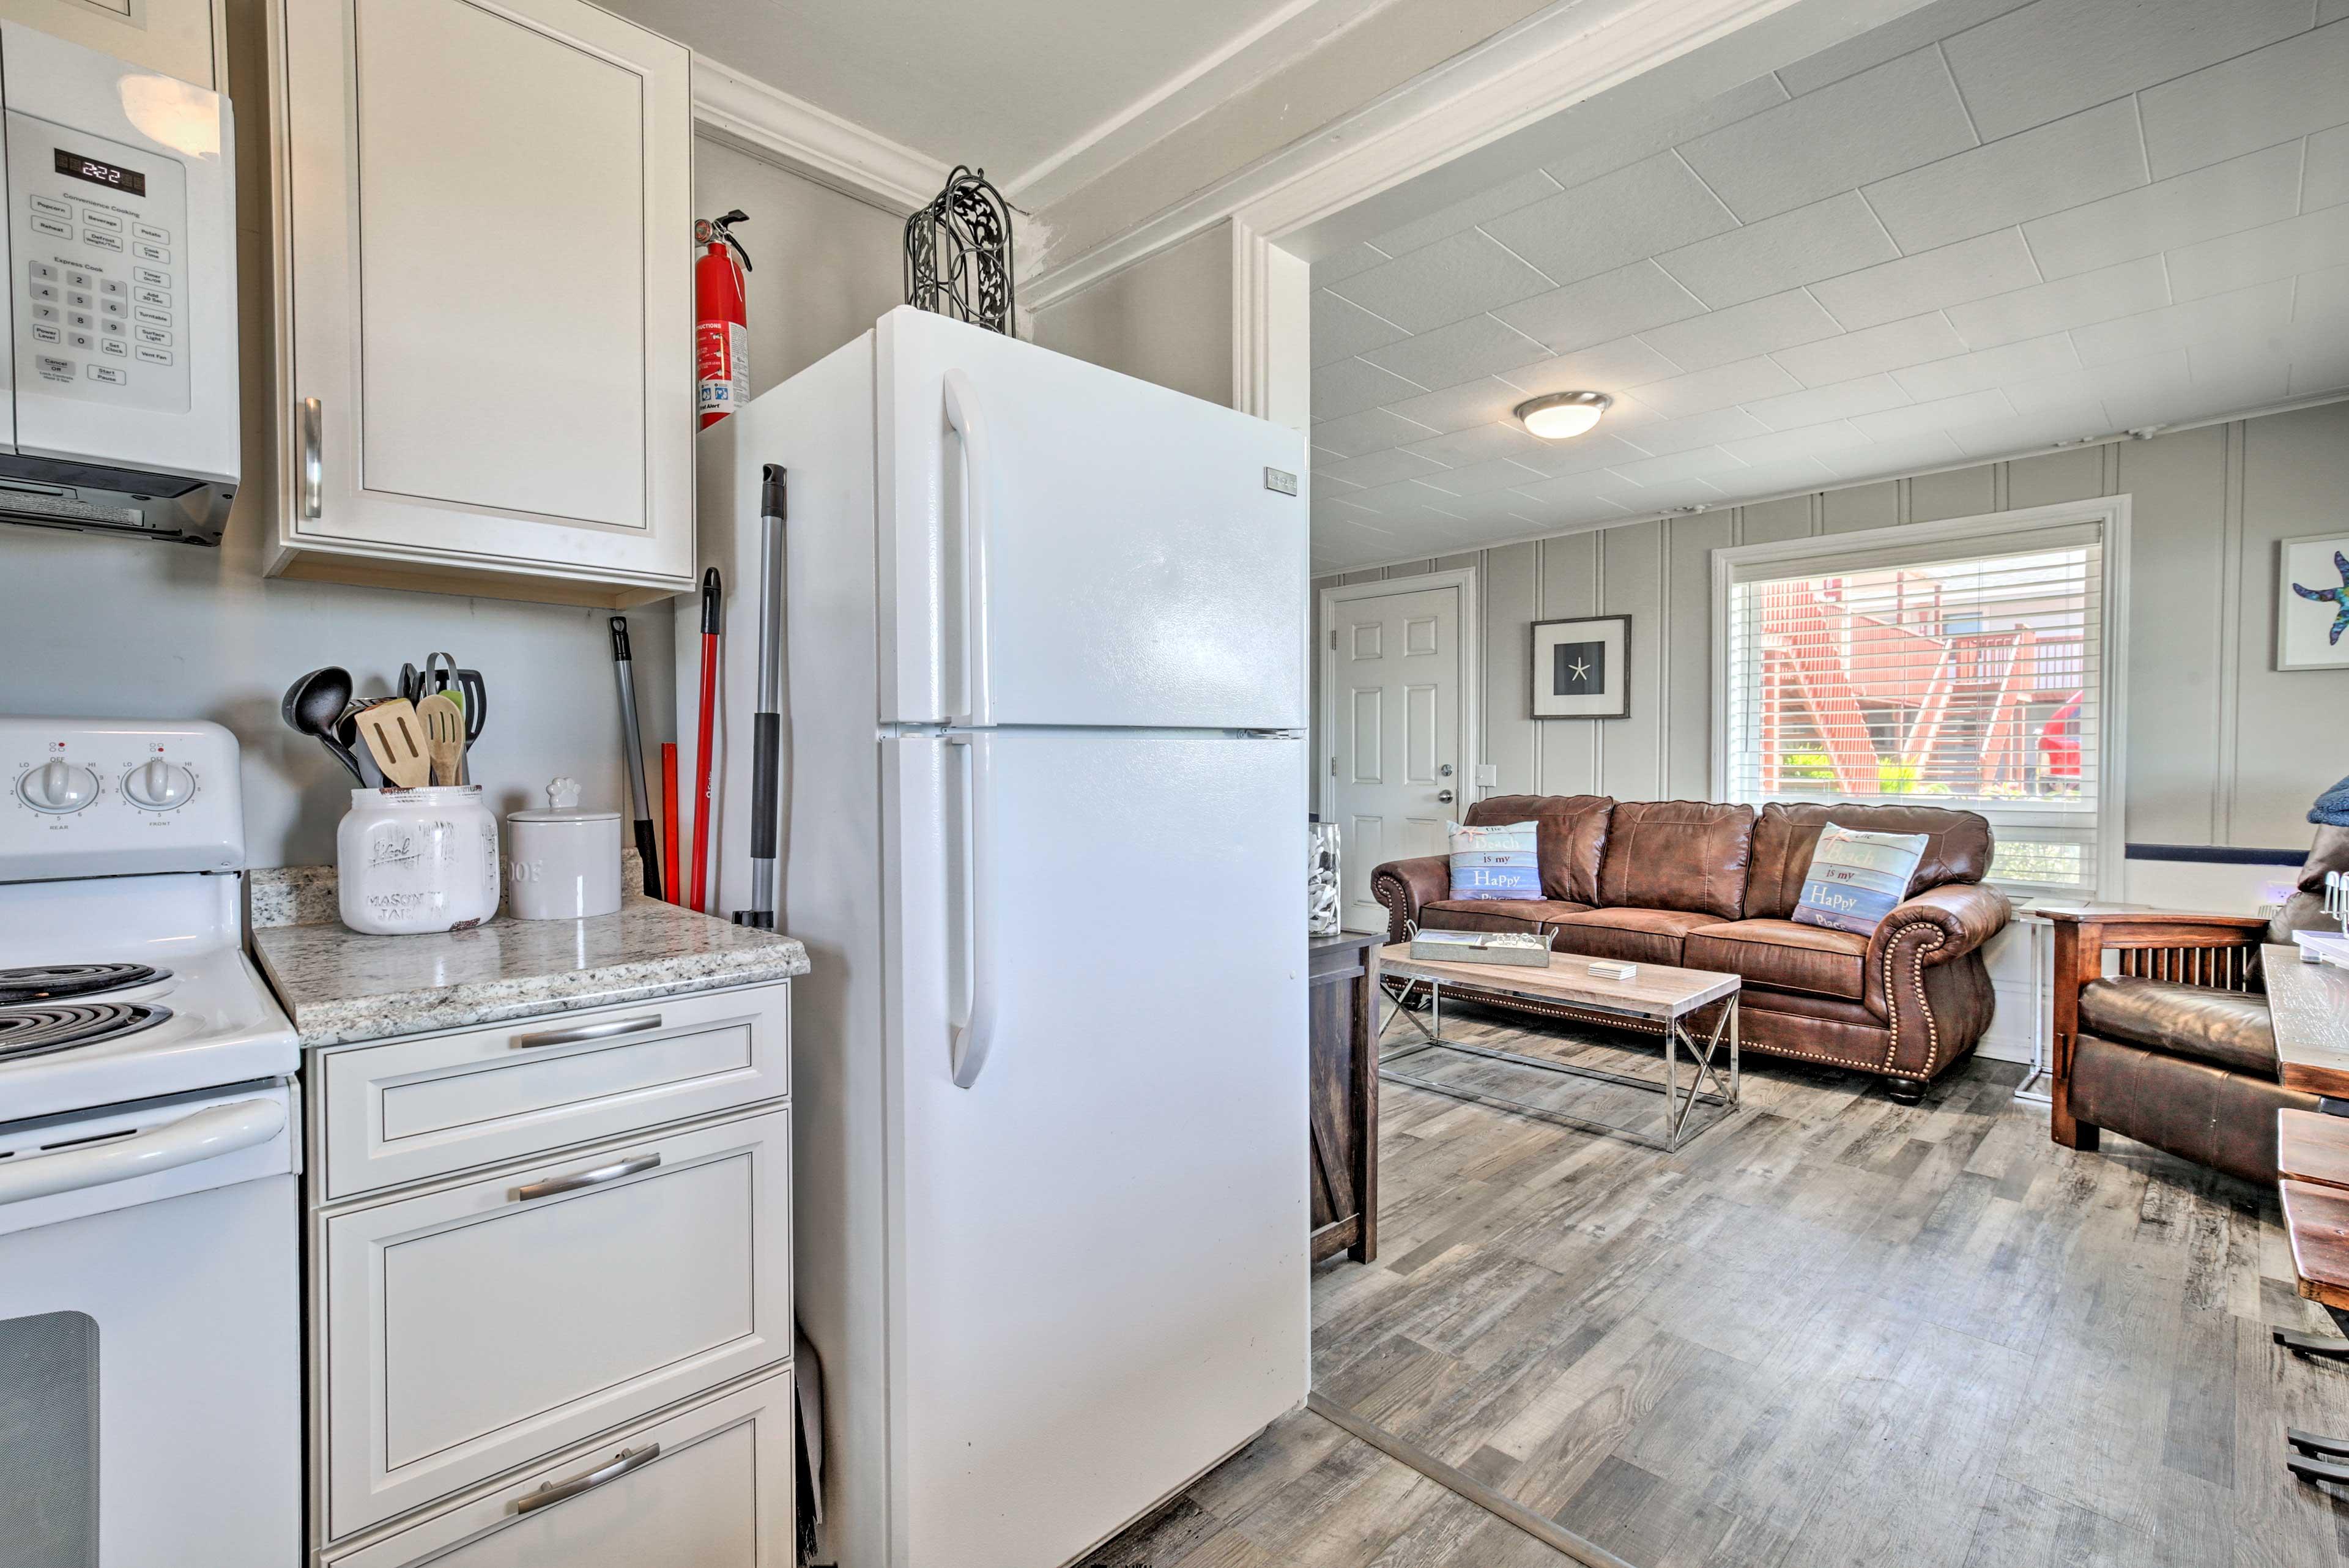 The kitchen is tucked just around the corner!